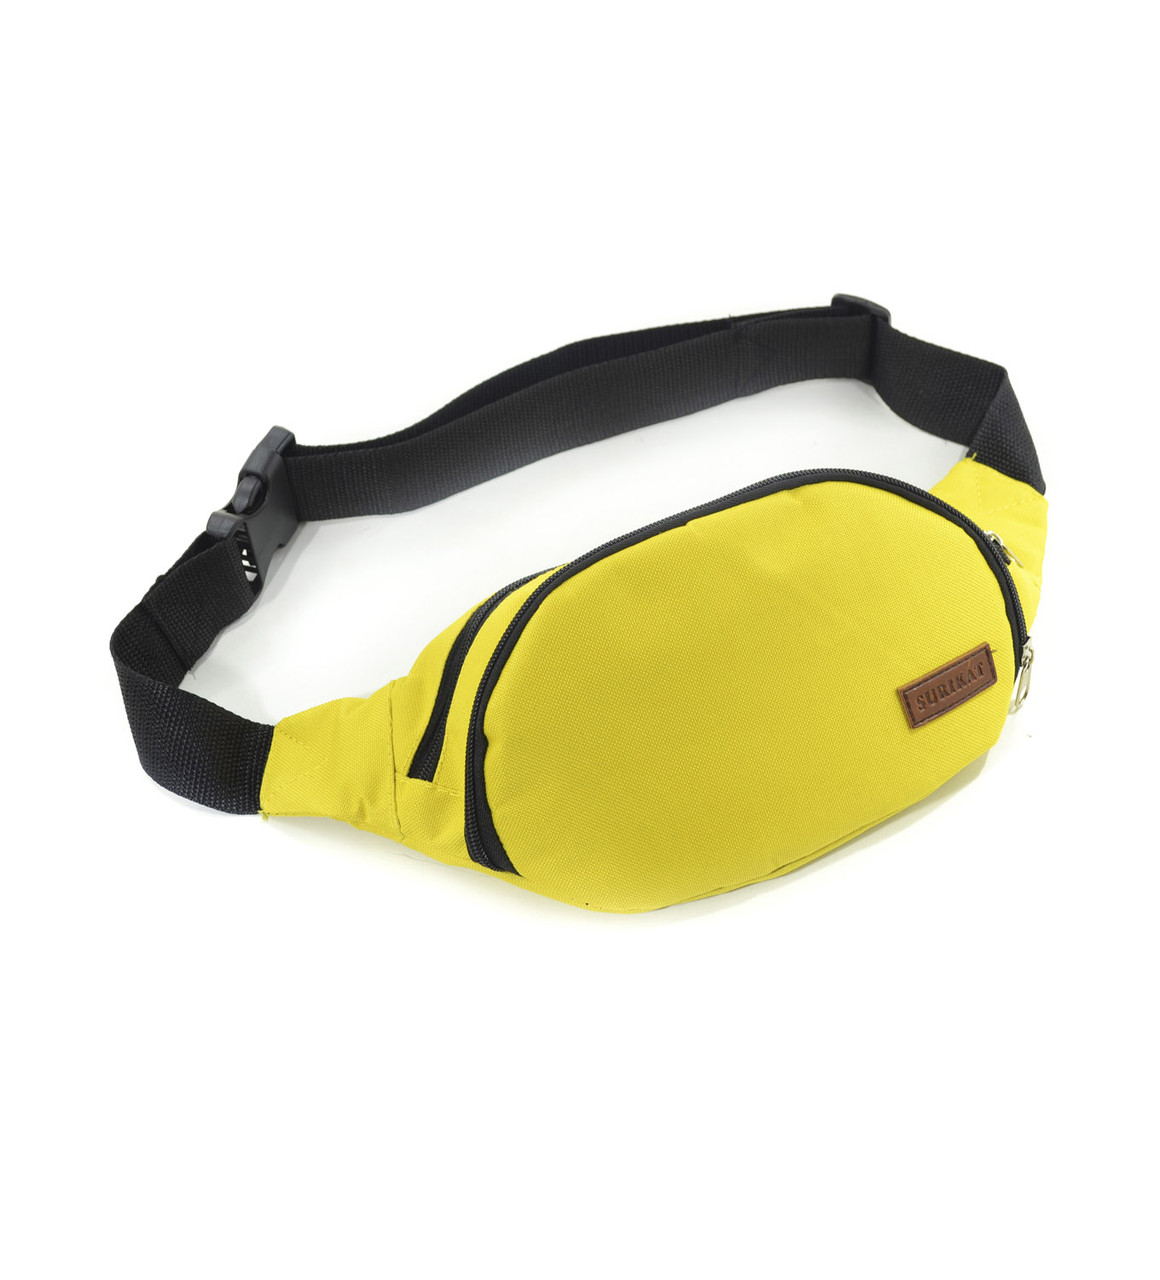 4474f58600cd Поясная сумка бананка желтая Banan Surikat (сумка на пояс, сумки, сумка  мужская,